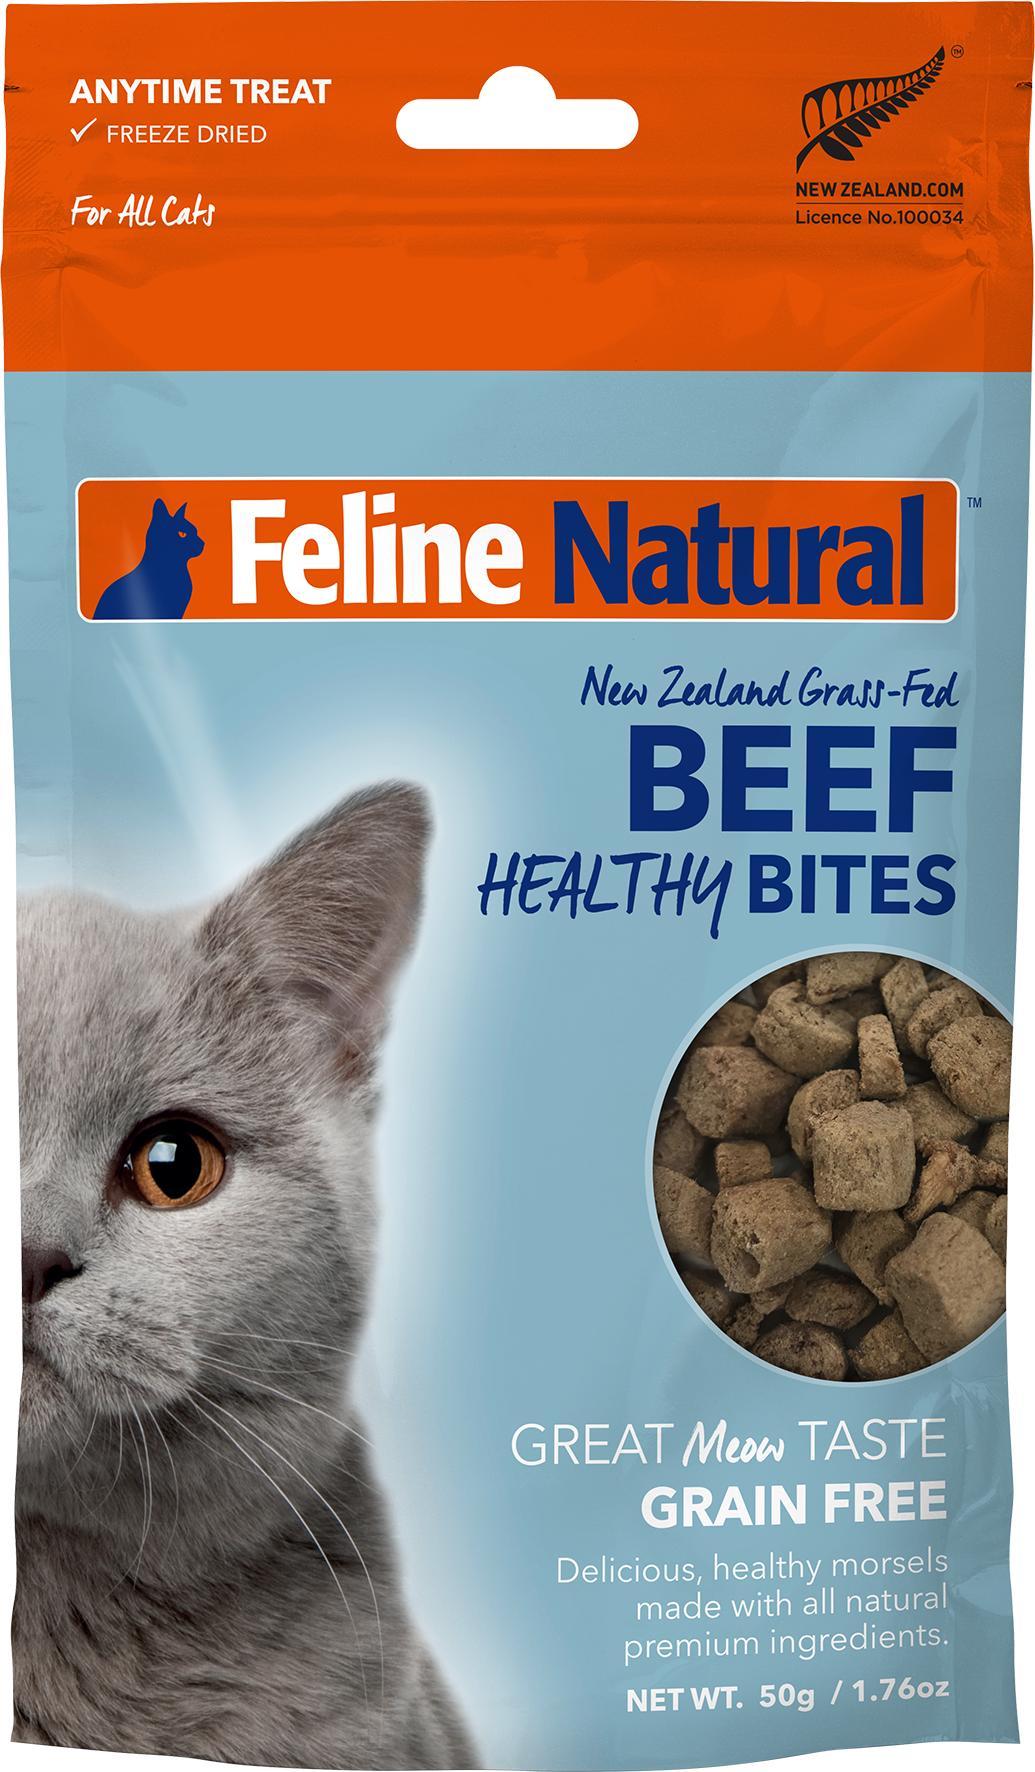 Feline Natural Healthy Bites Beef Freeze-Dried Cat Treats, 1.76-oz